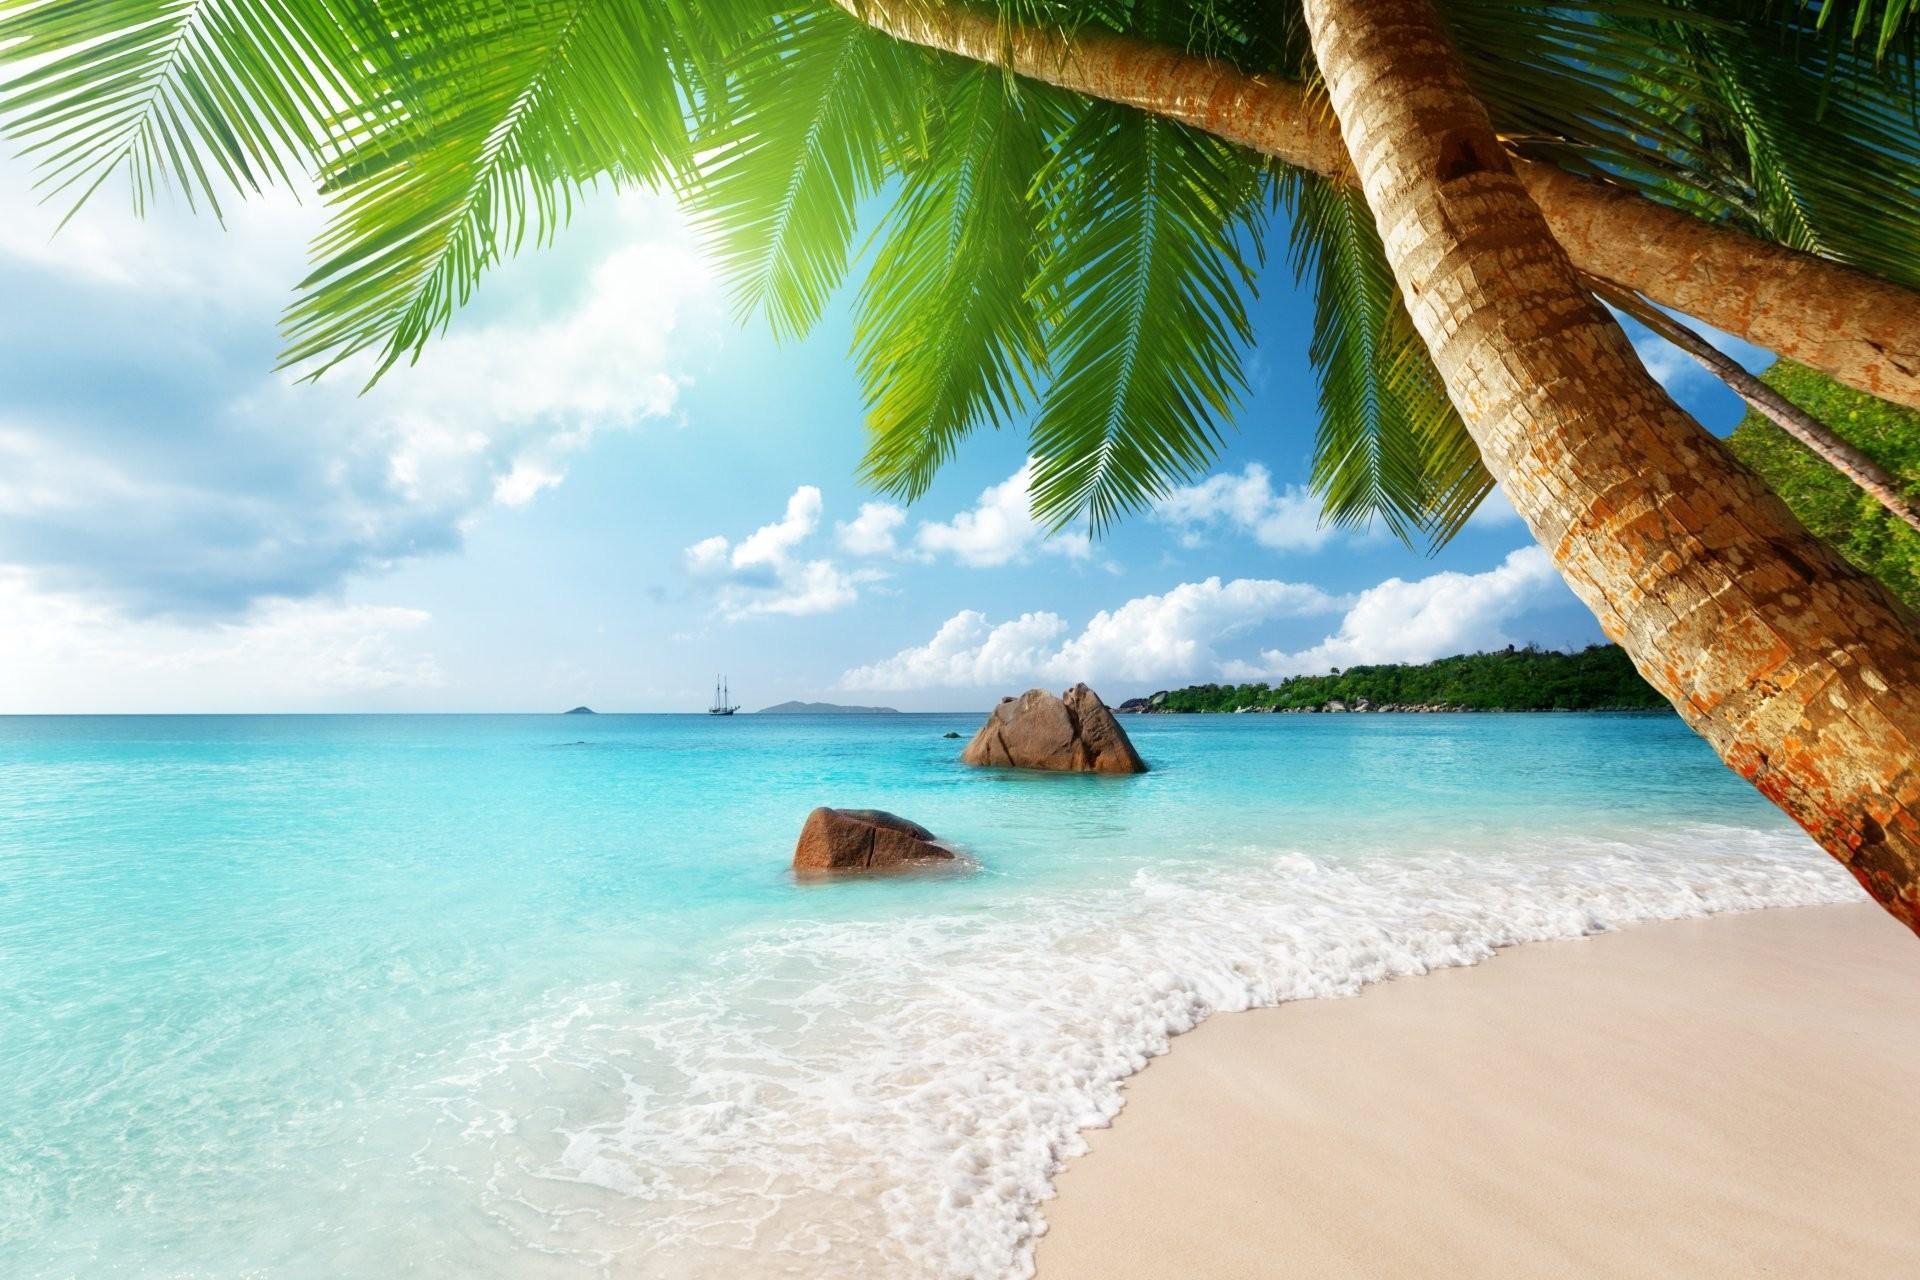 Paradise Beach Wallpaper ·① WallpaperTag